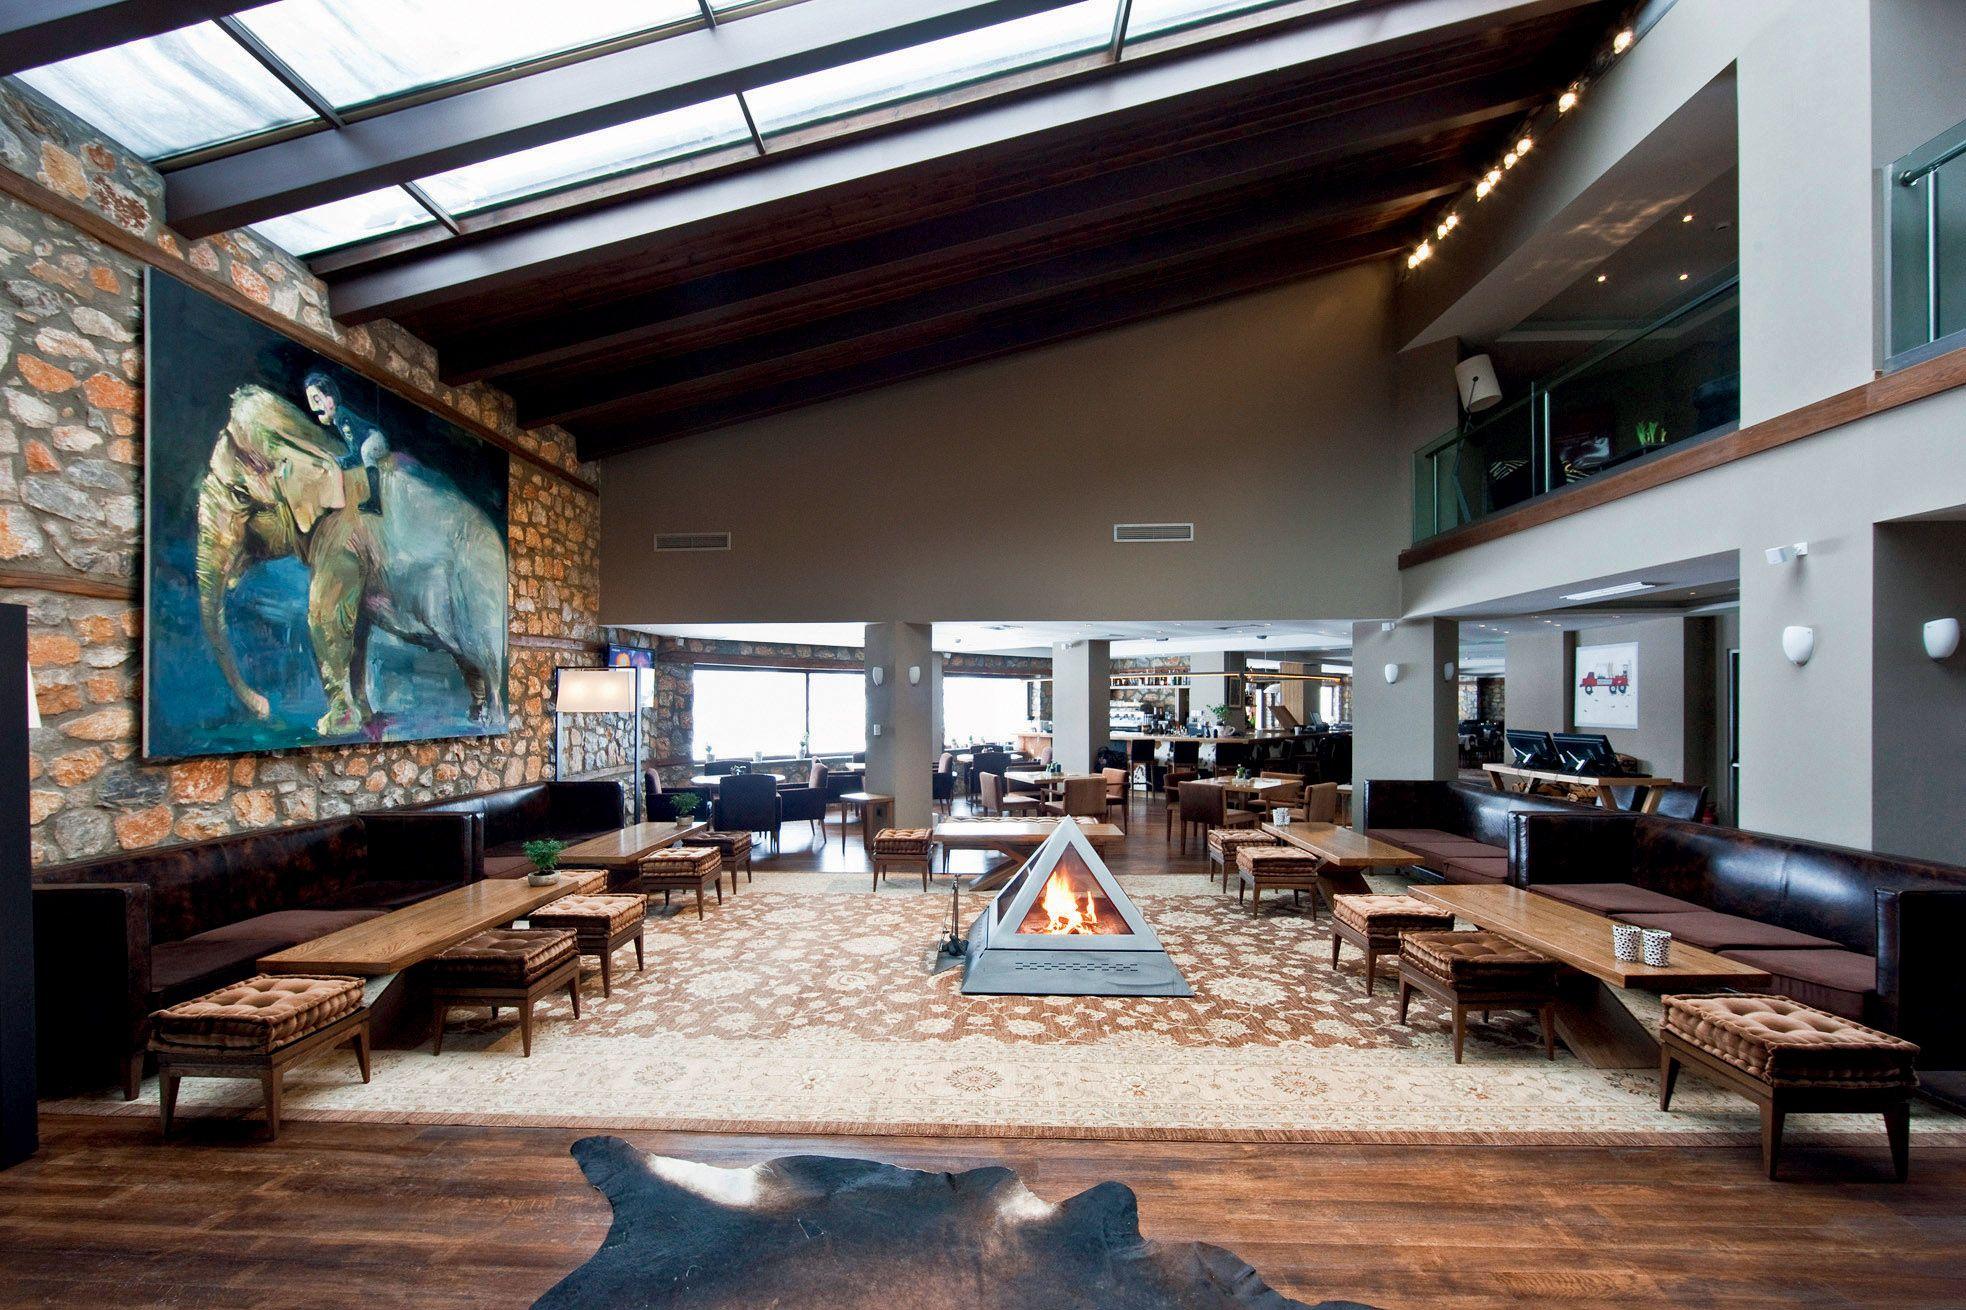 Miramonte chalet hotel spa at pella macedonia & thrace pinterest